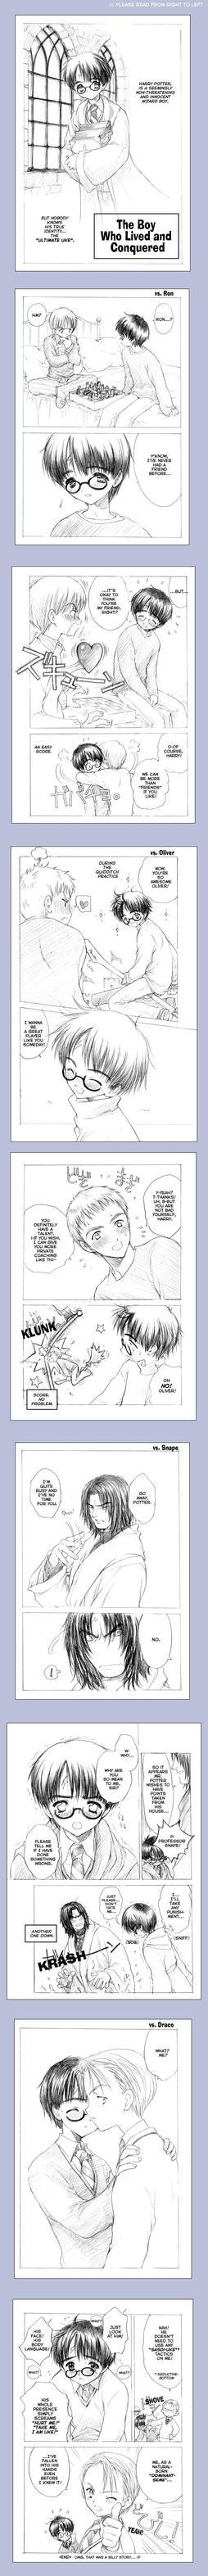 Boy Who Conquered : Yaoi by yukipon